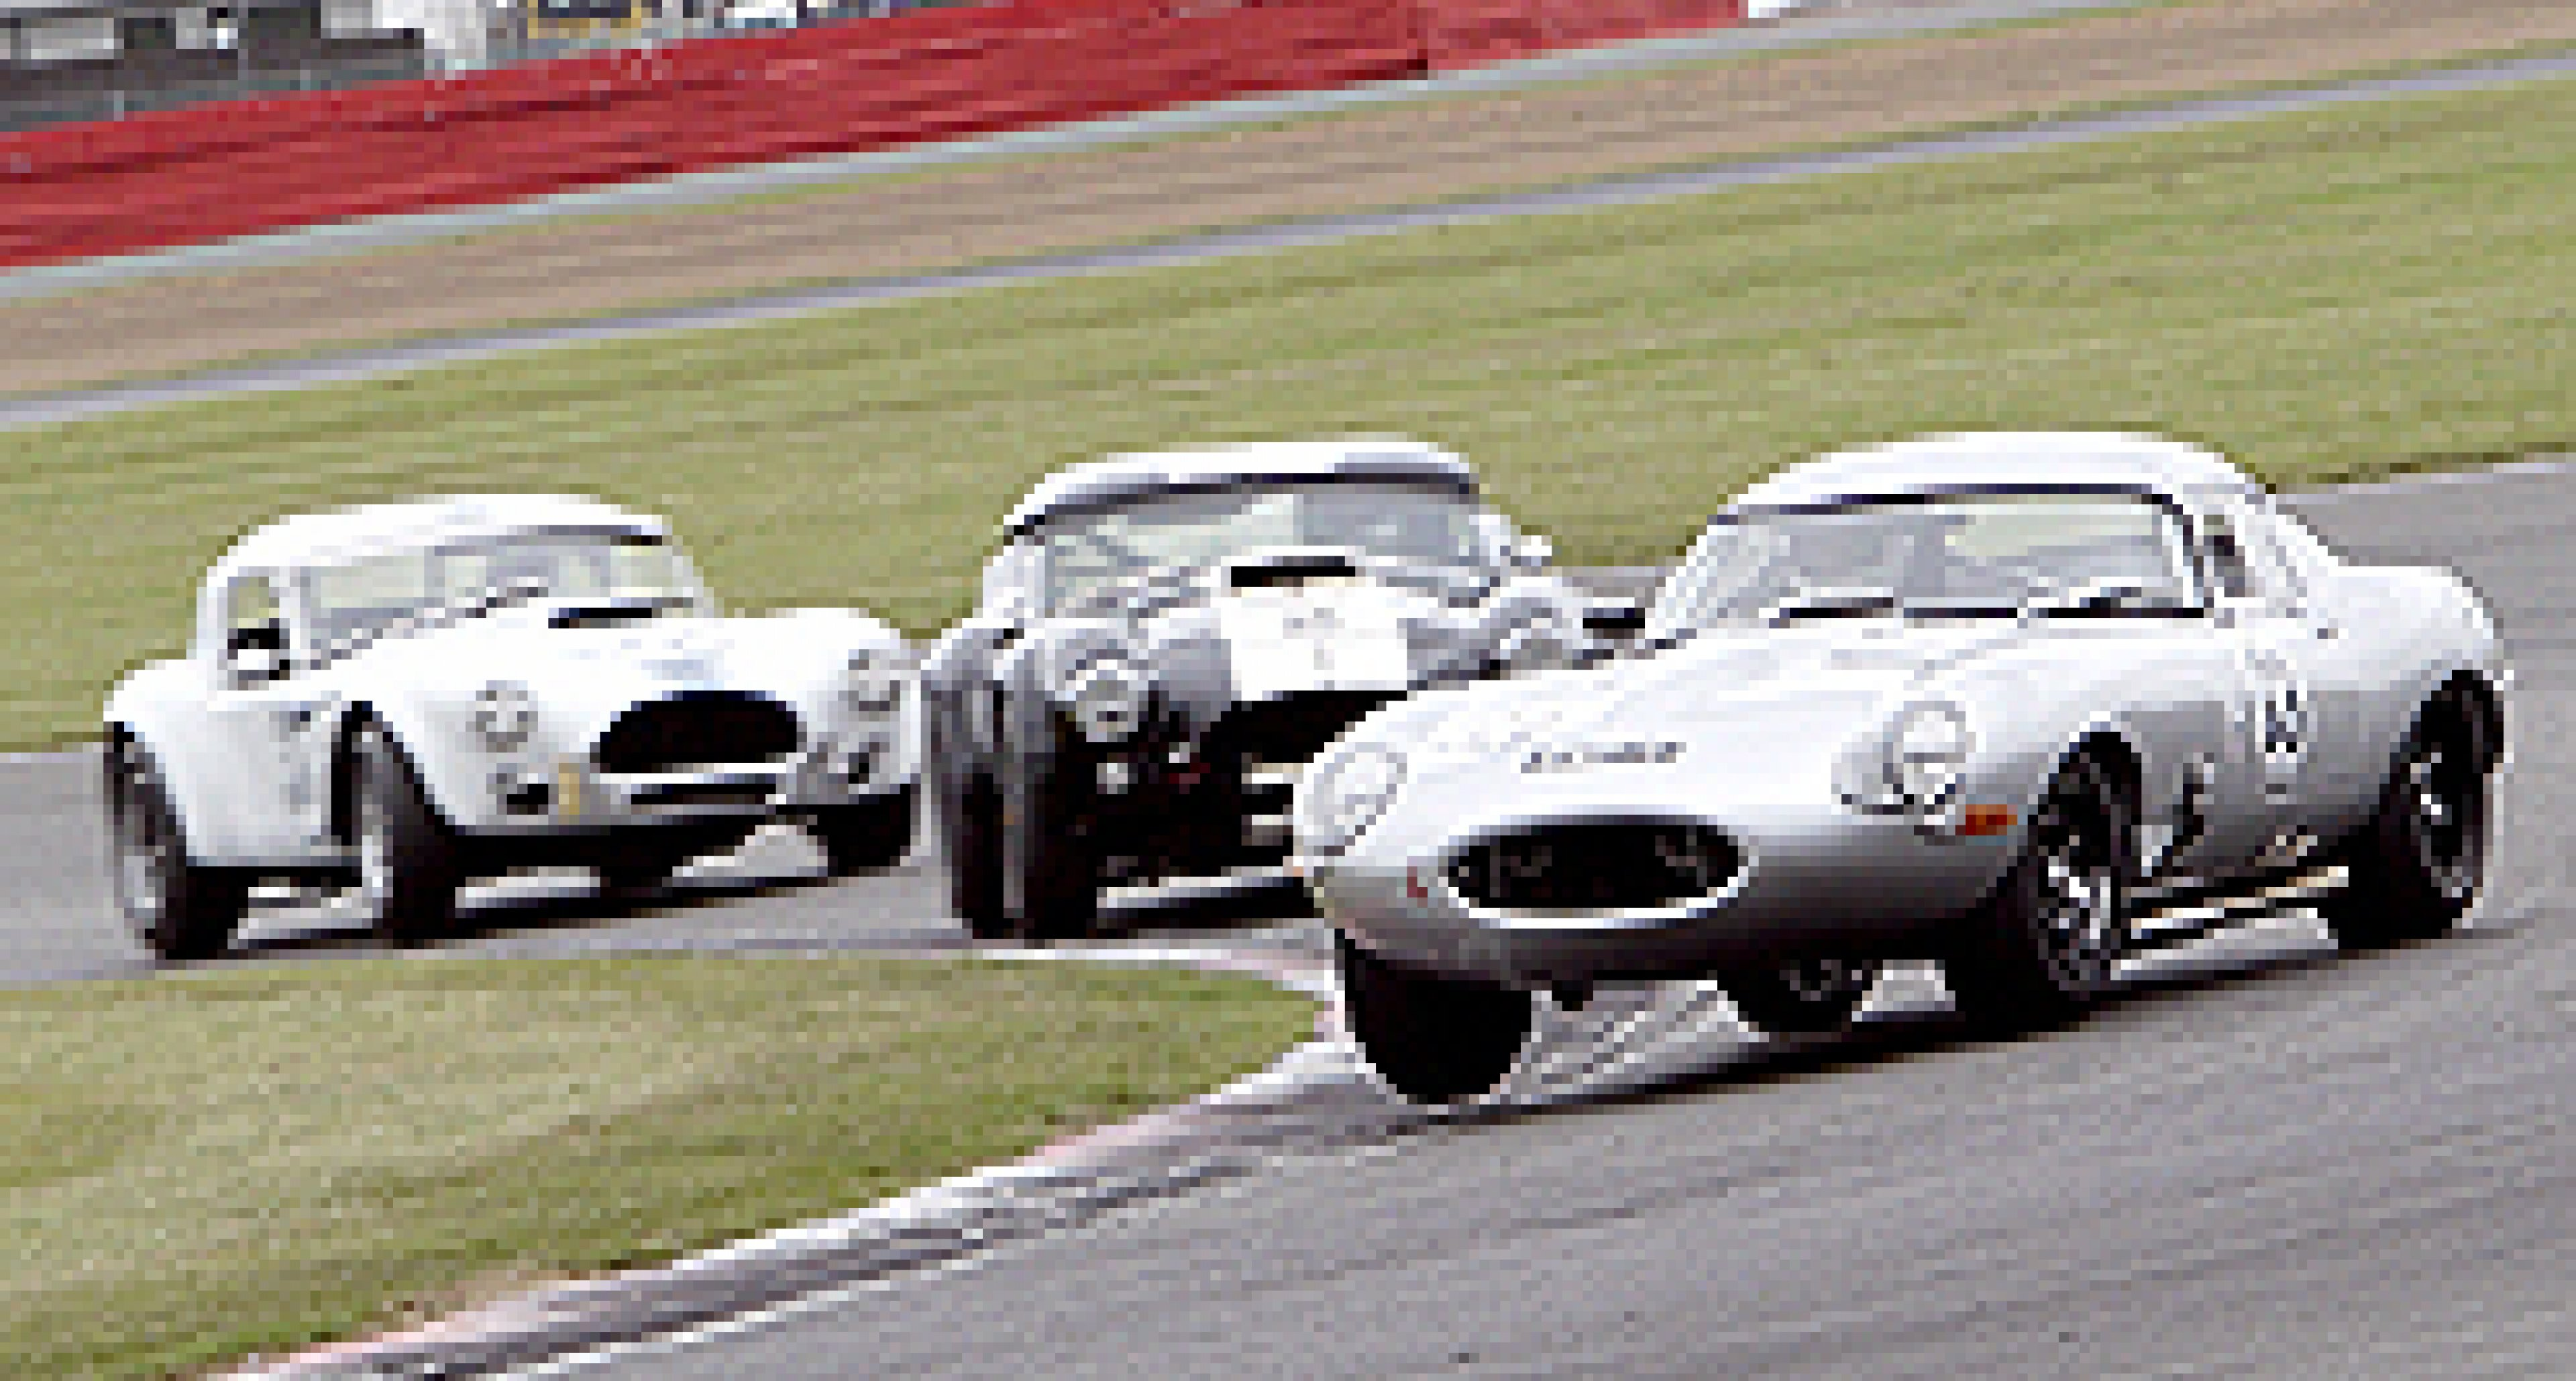 Silverstone Classic 2011 erwartet über 1.000 Jaguar E-Type